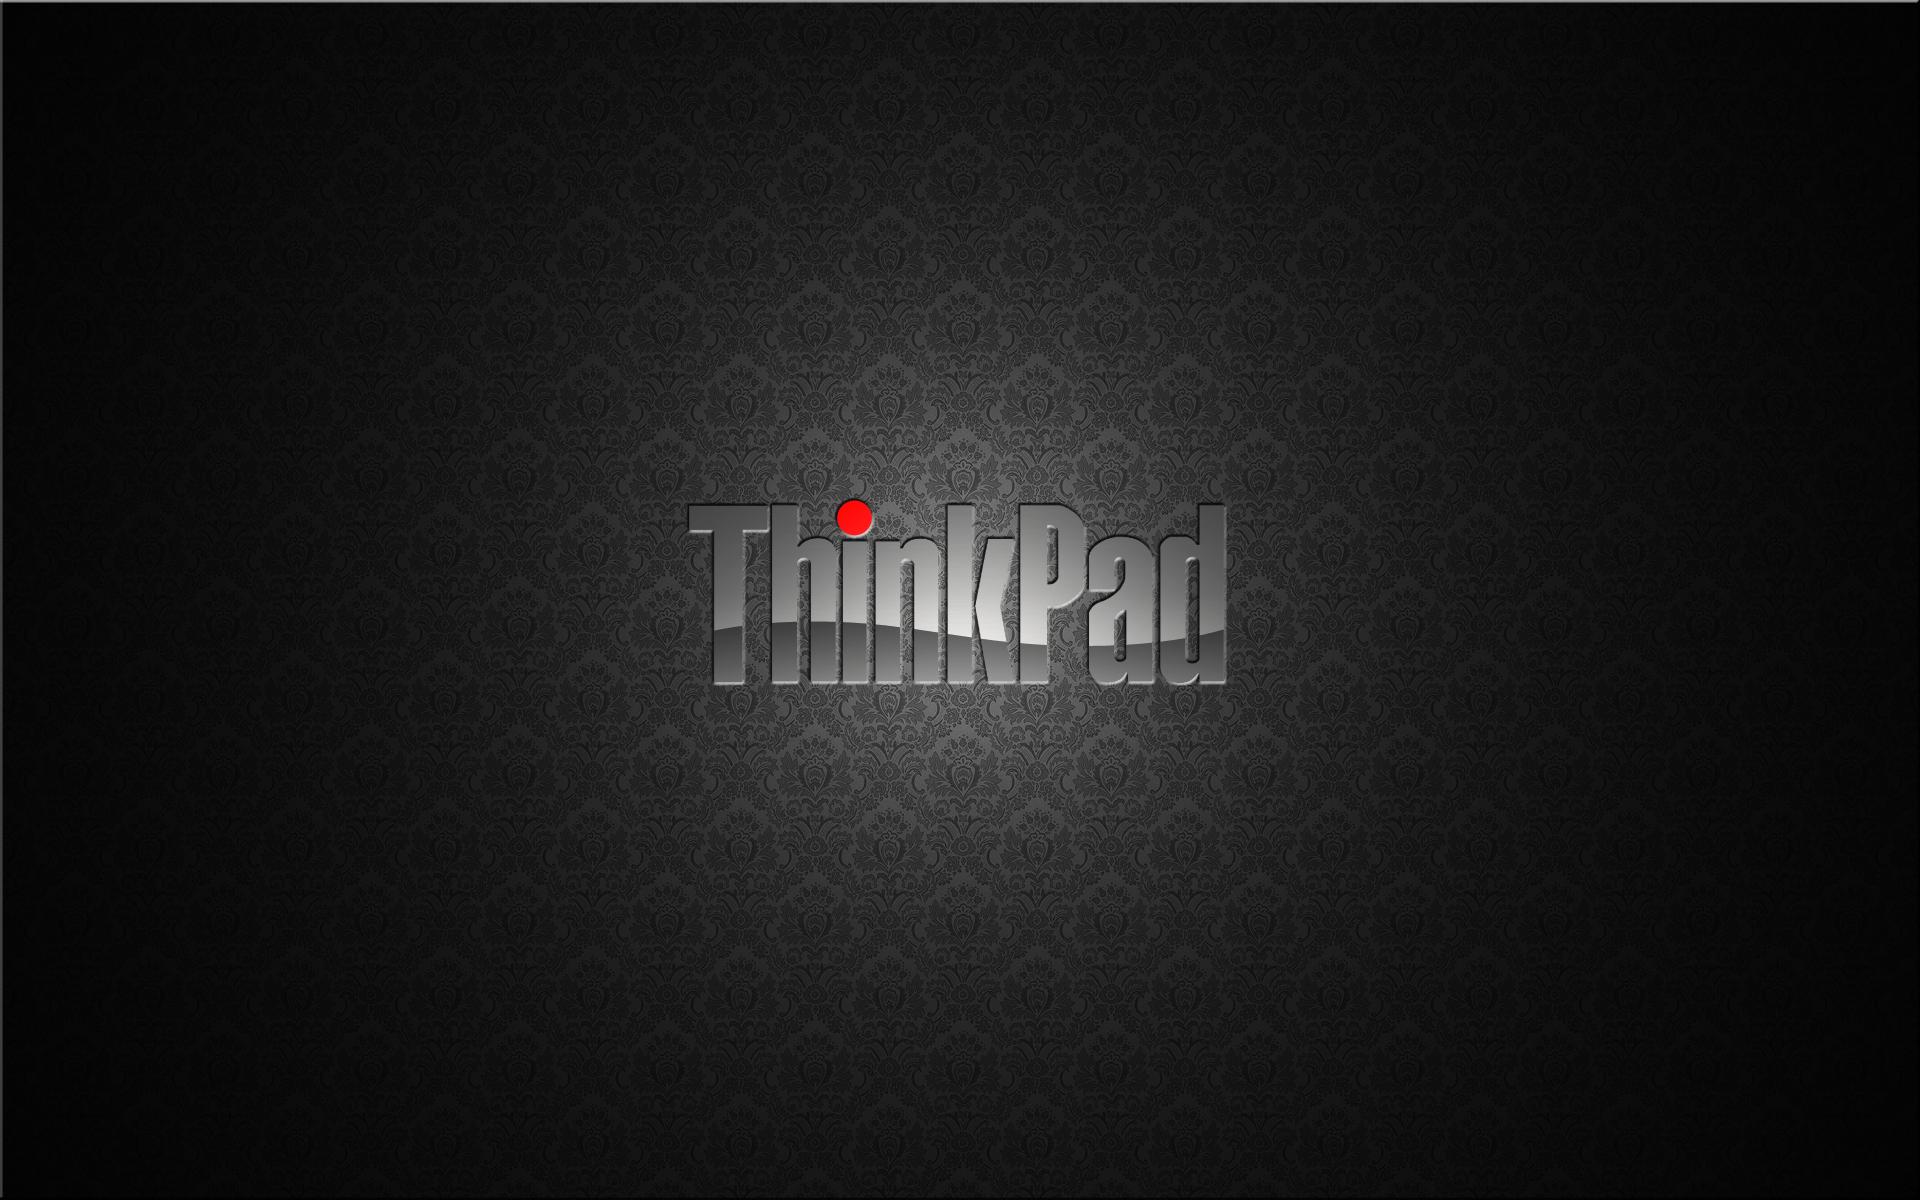 thinkpad wallpapers wallpaper - photo #24